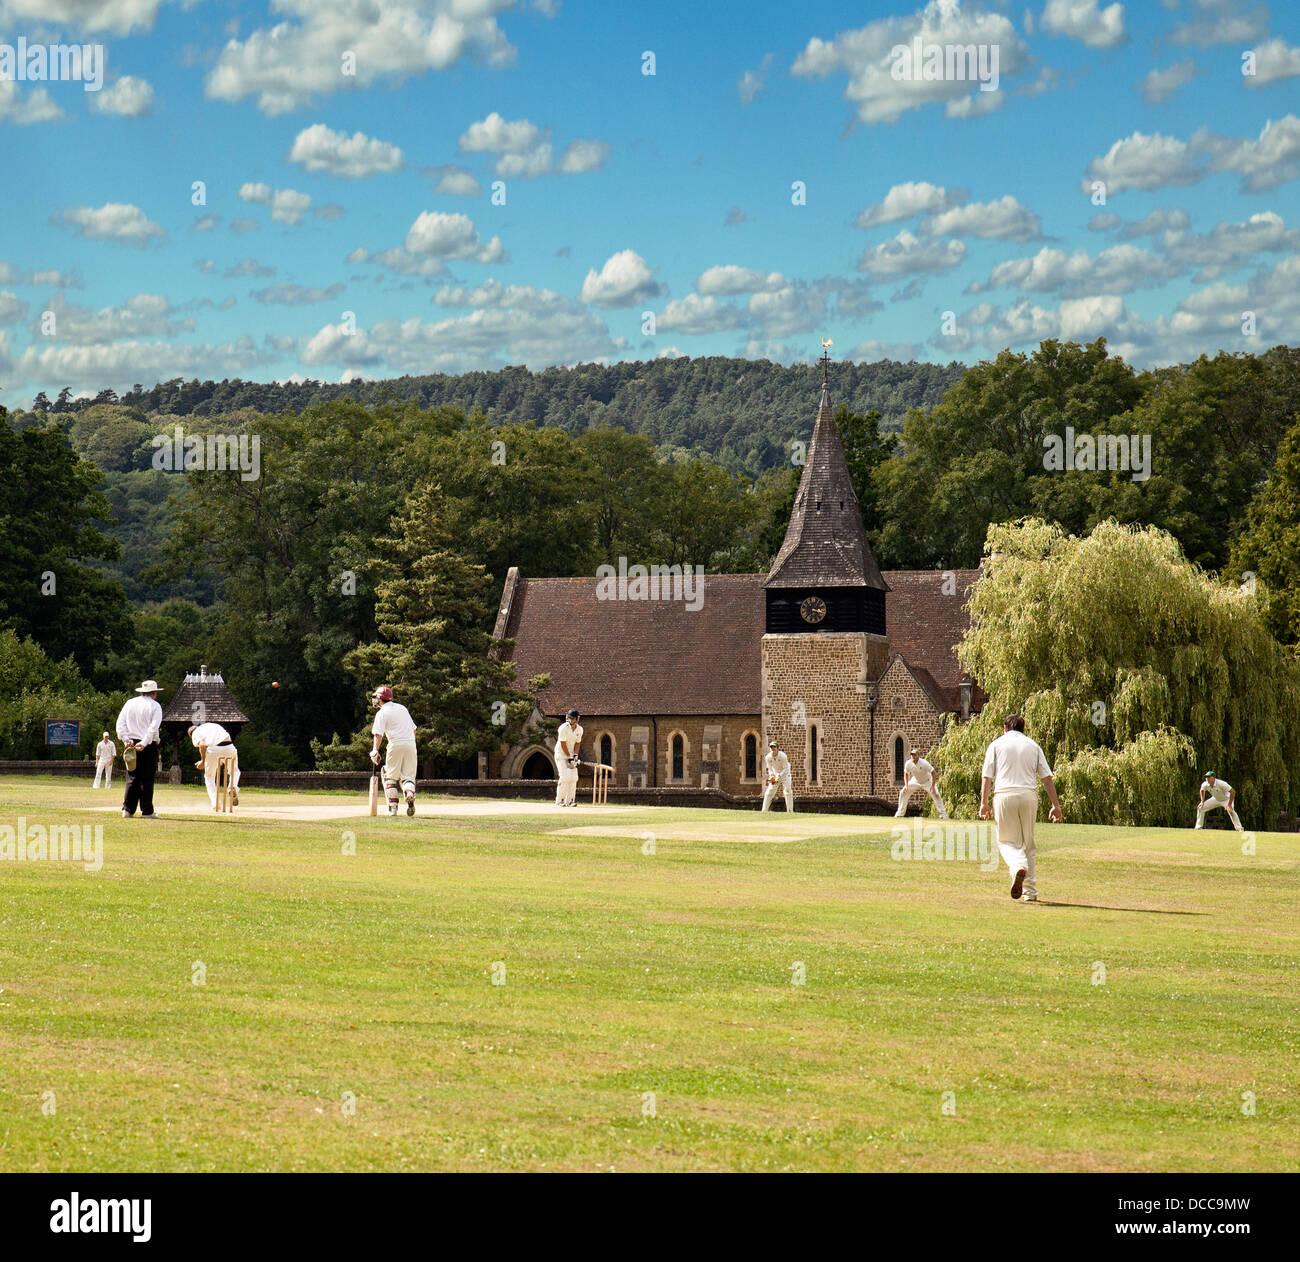 Dorf Cricket bei Grayswood, Surrey. Stockbild